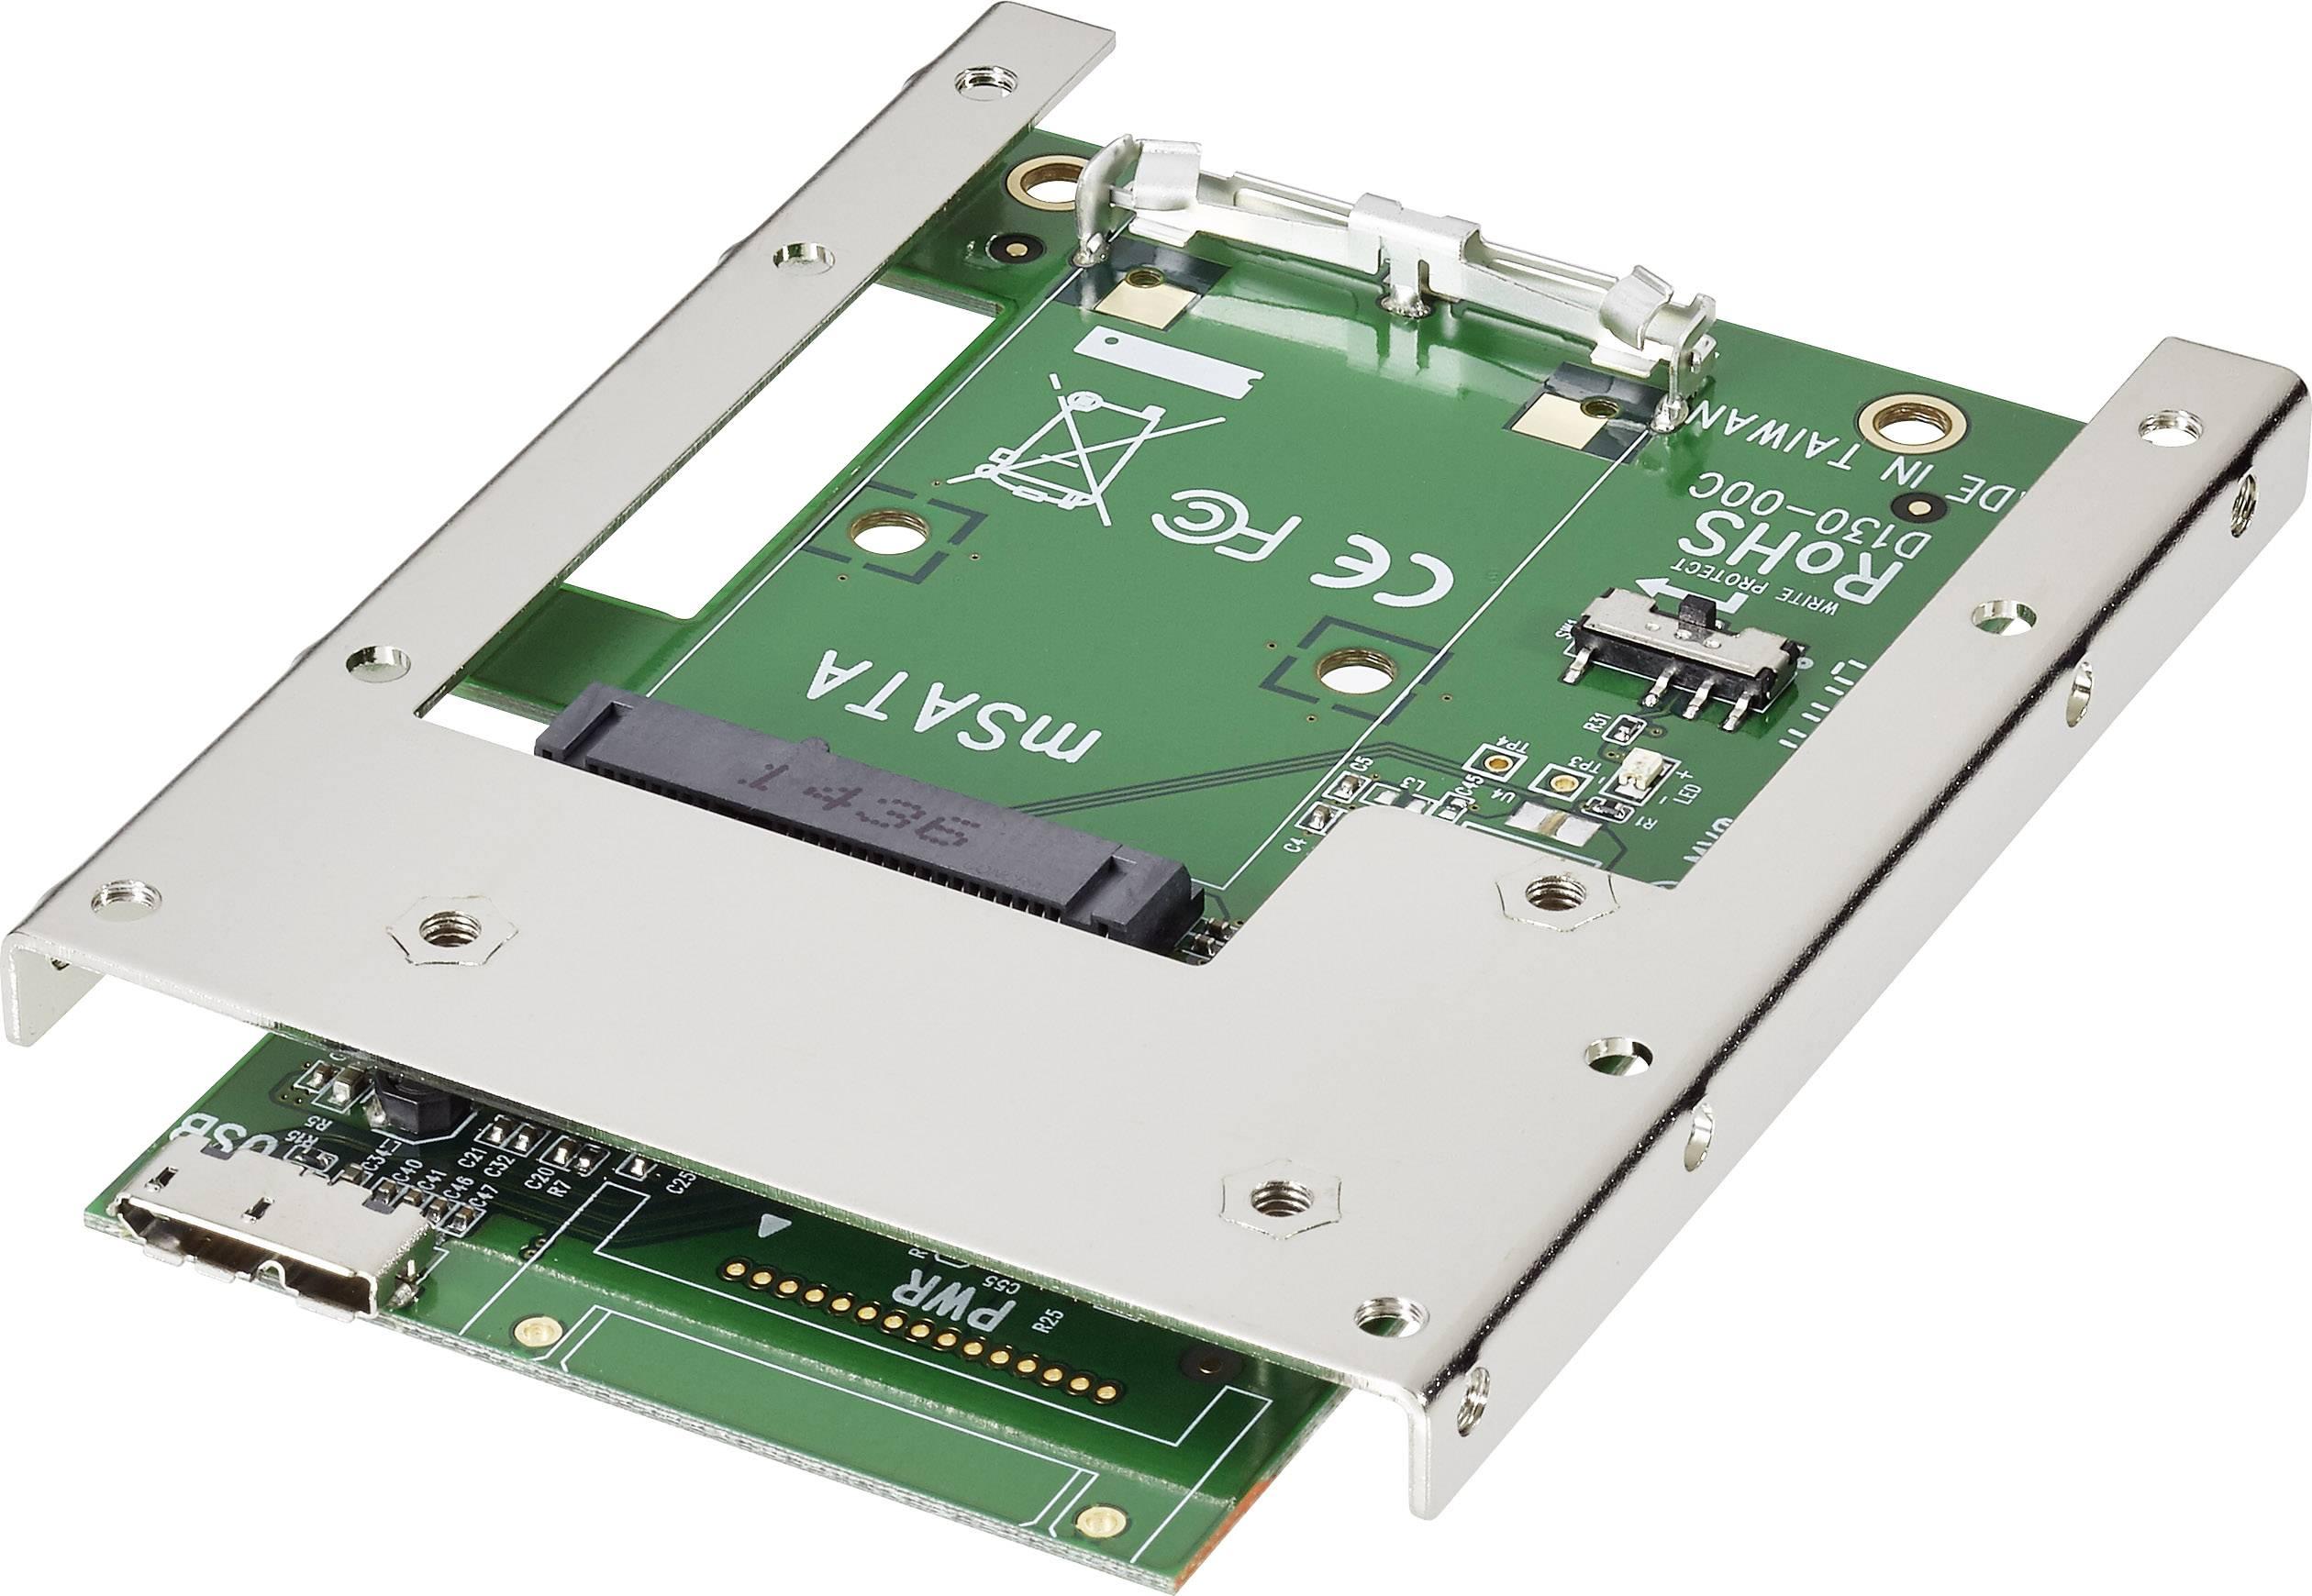 Konvertor rozhrania Renkforce 28554C163 RF-2000362, [1x mini SATA zástrčka - 2x micro USB 3.0 zásuvka B]